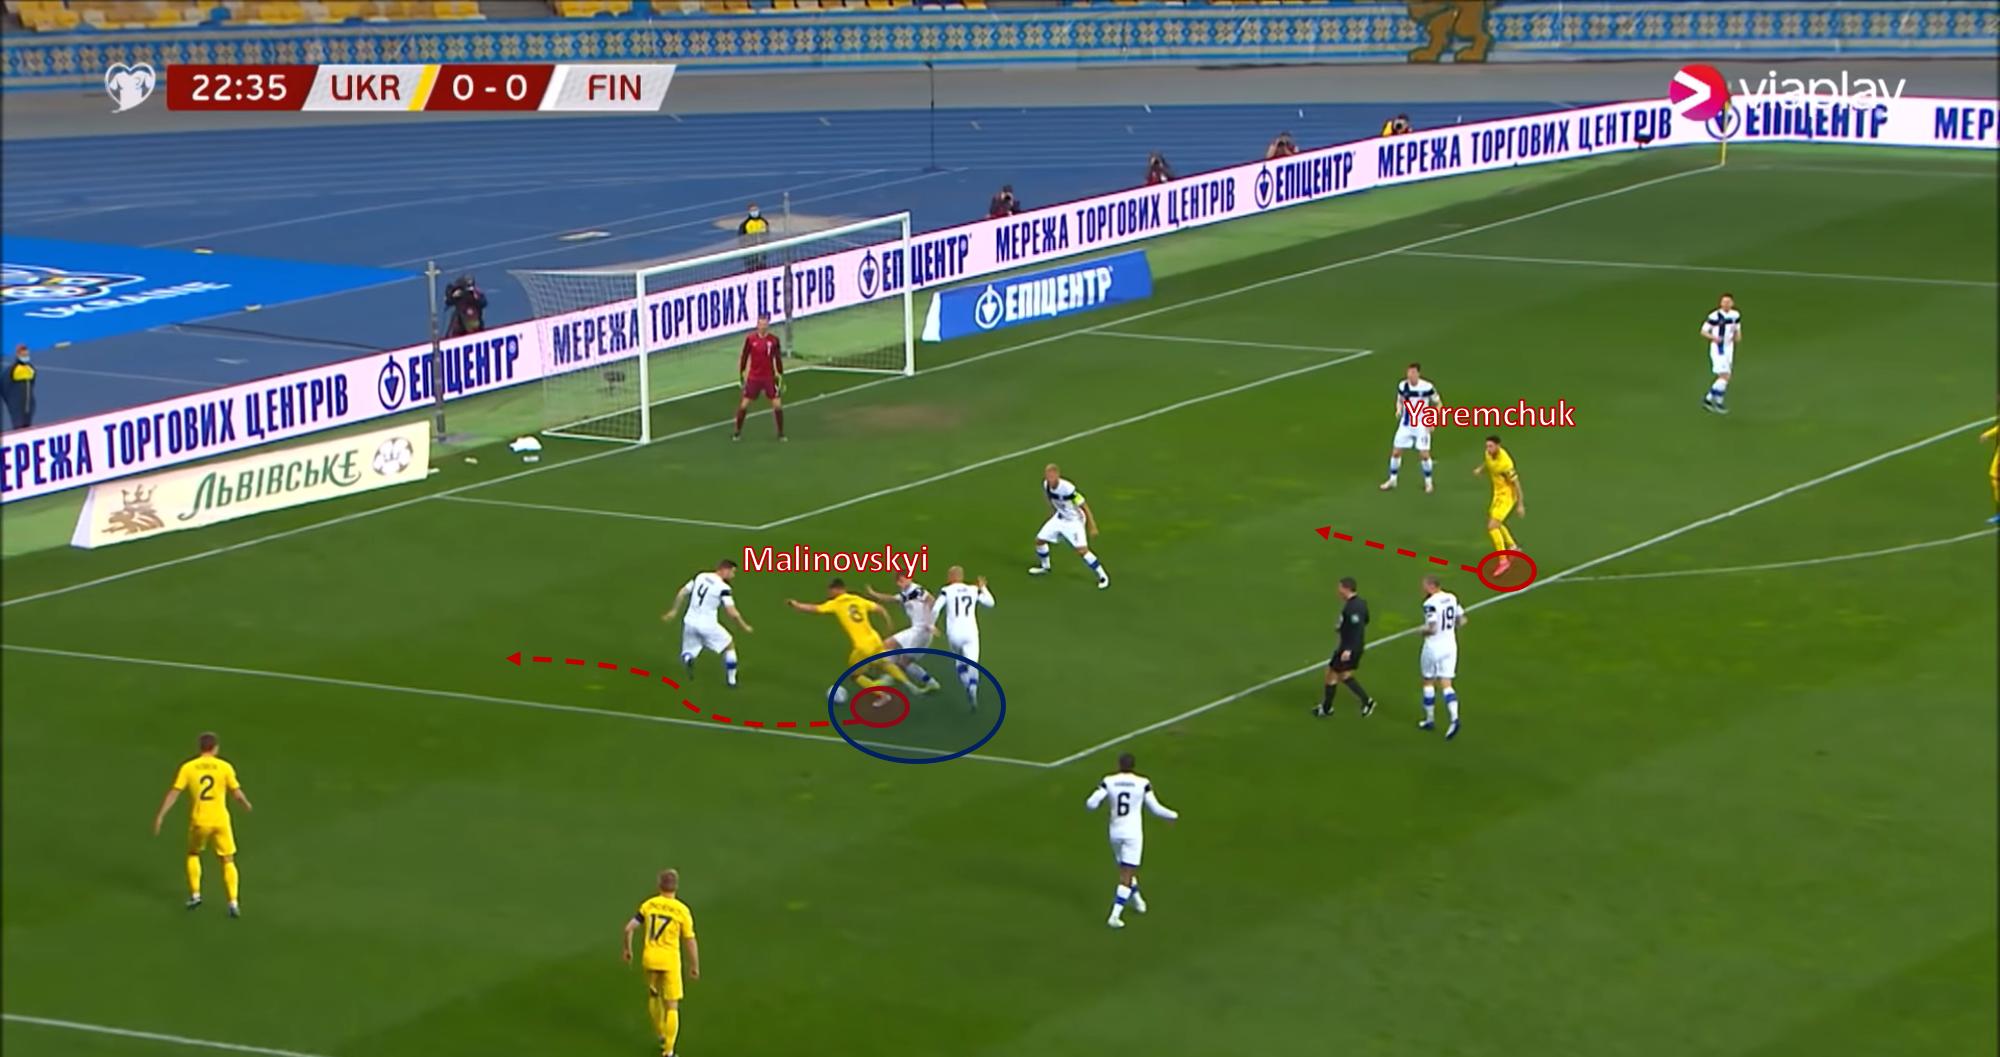 Ukraine 2020/21: Their tactics at Euro 2020 - scout report - tactical analysis tactics